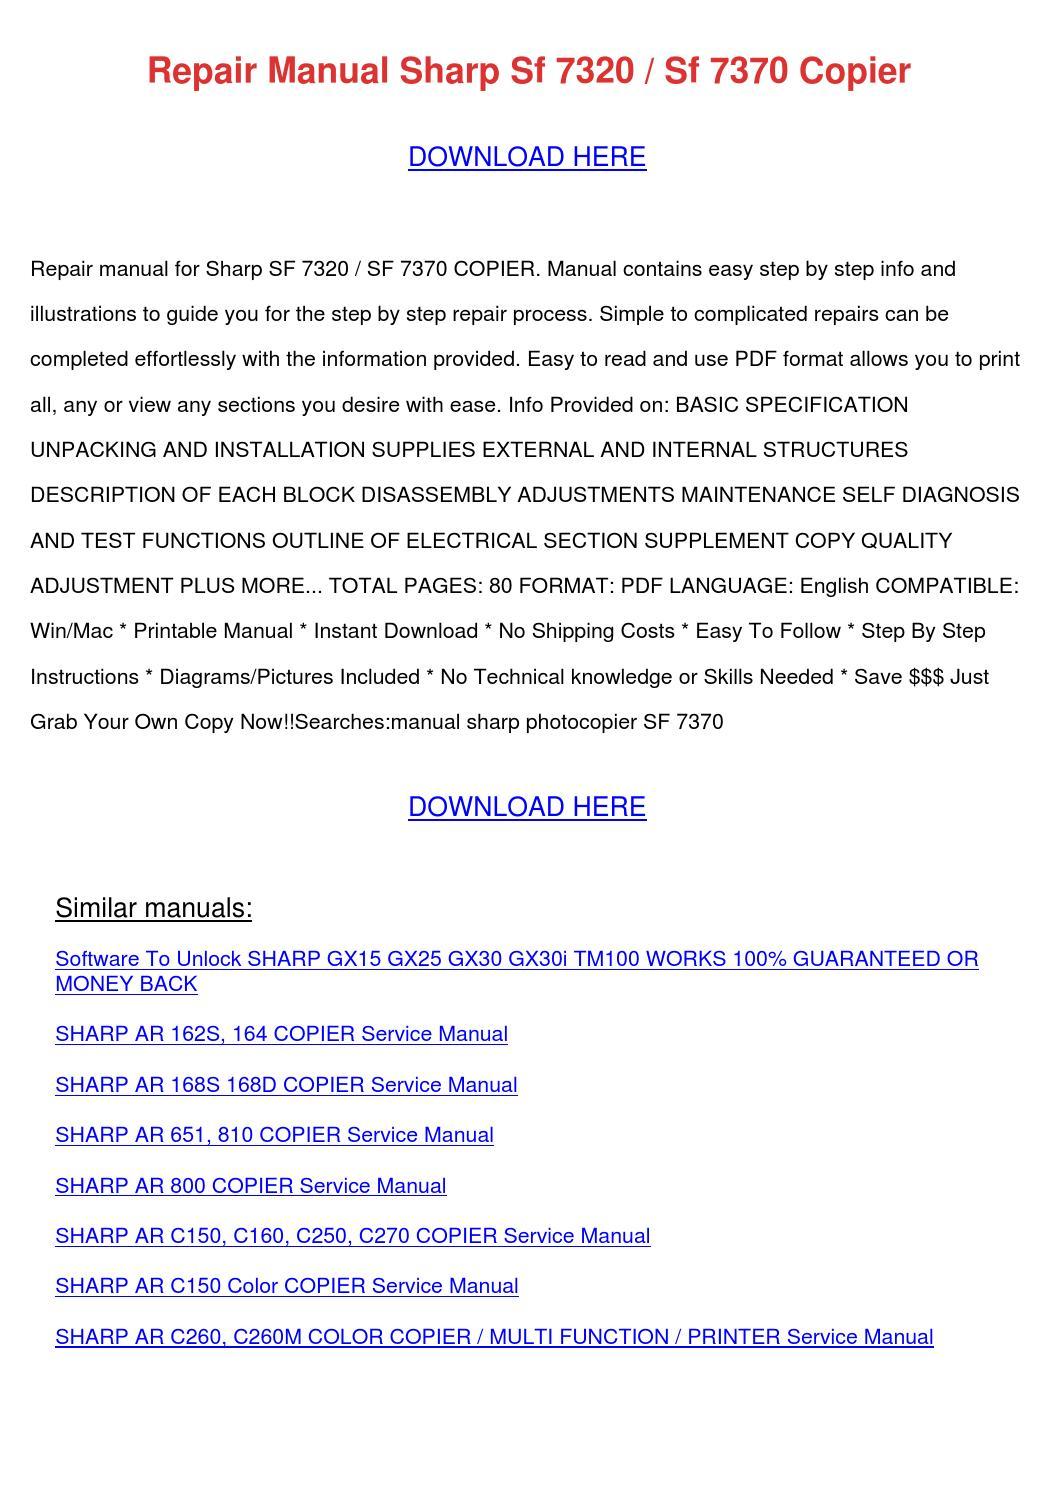 repair manual sharp sf 7320 sf 7370 copier by tommyscarbrough issuu rh issuu com sharp sf 7370 manual SIC Code 7370